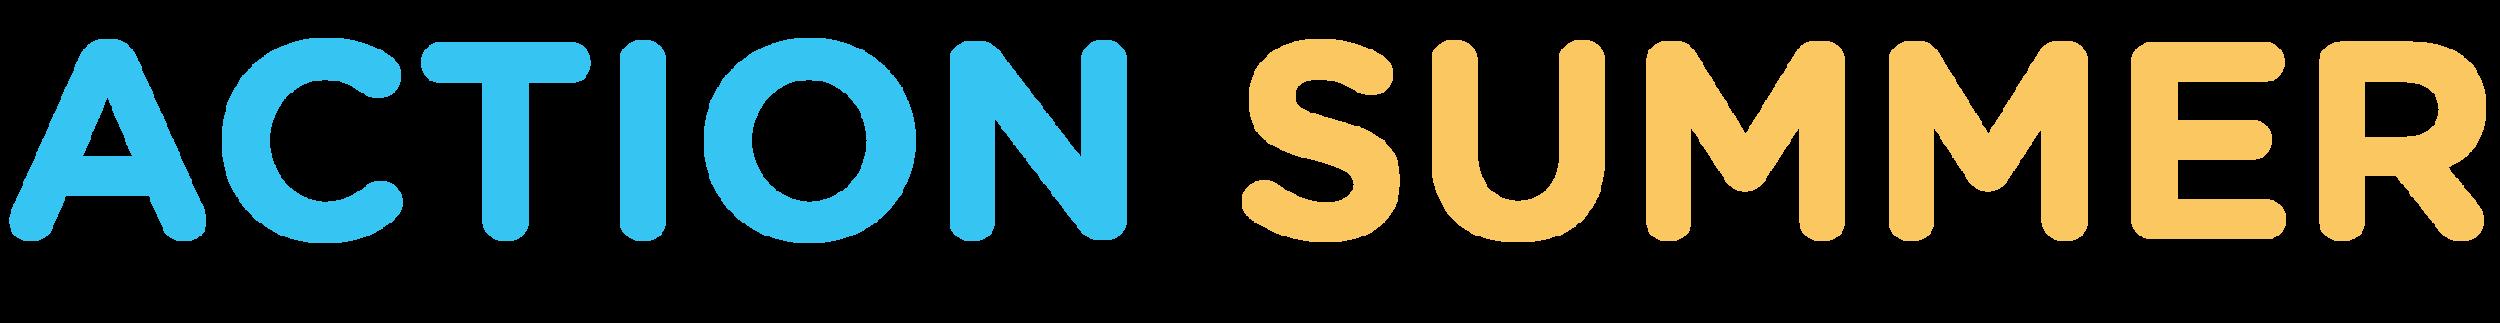 ActionSummer_Logo.png